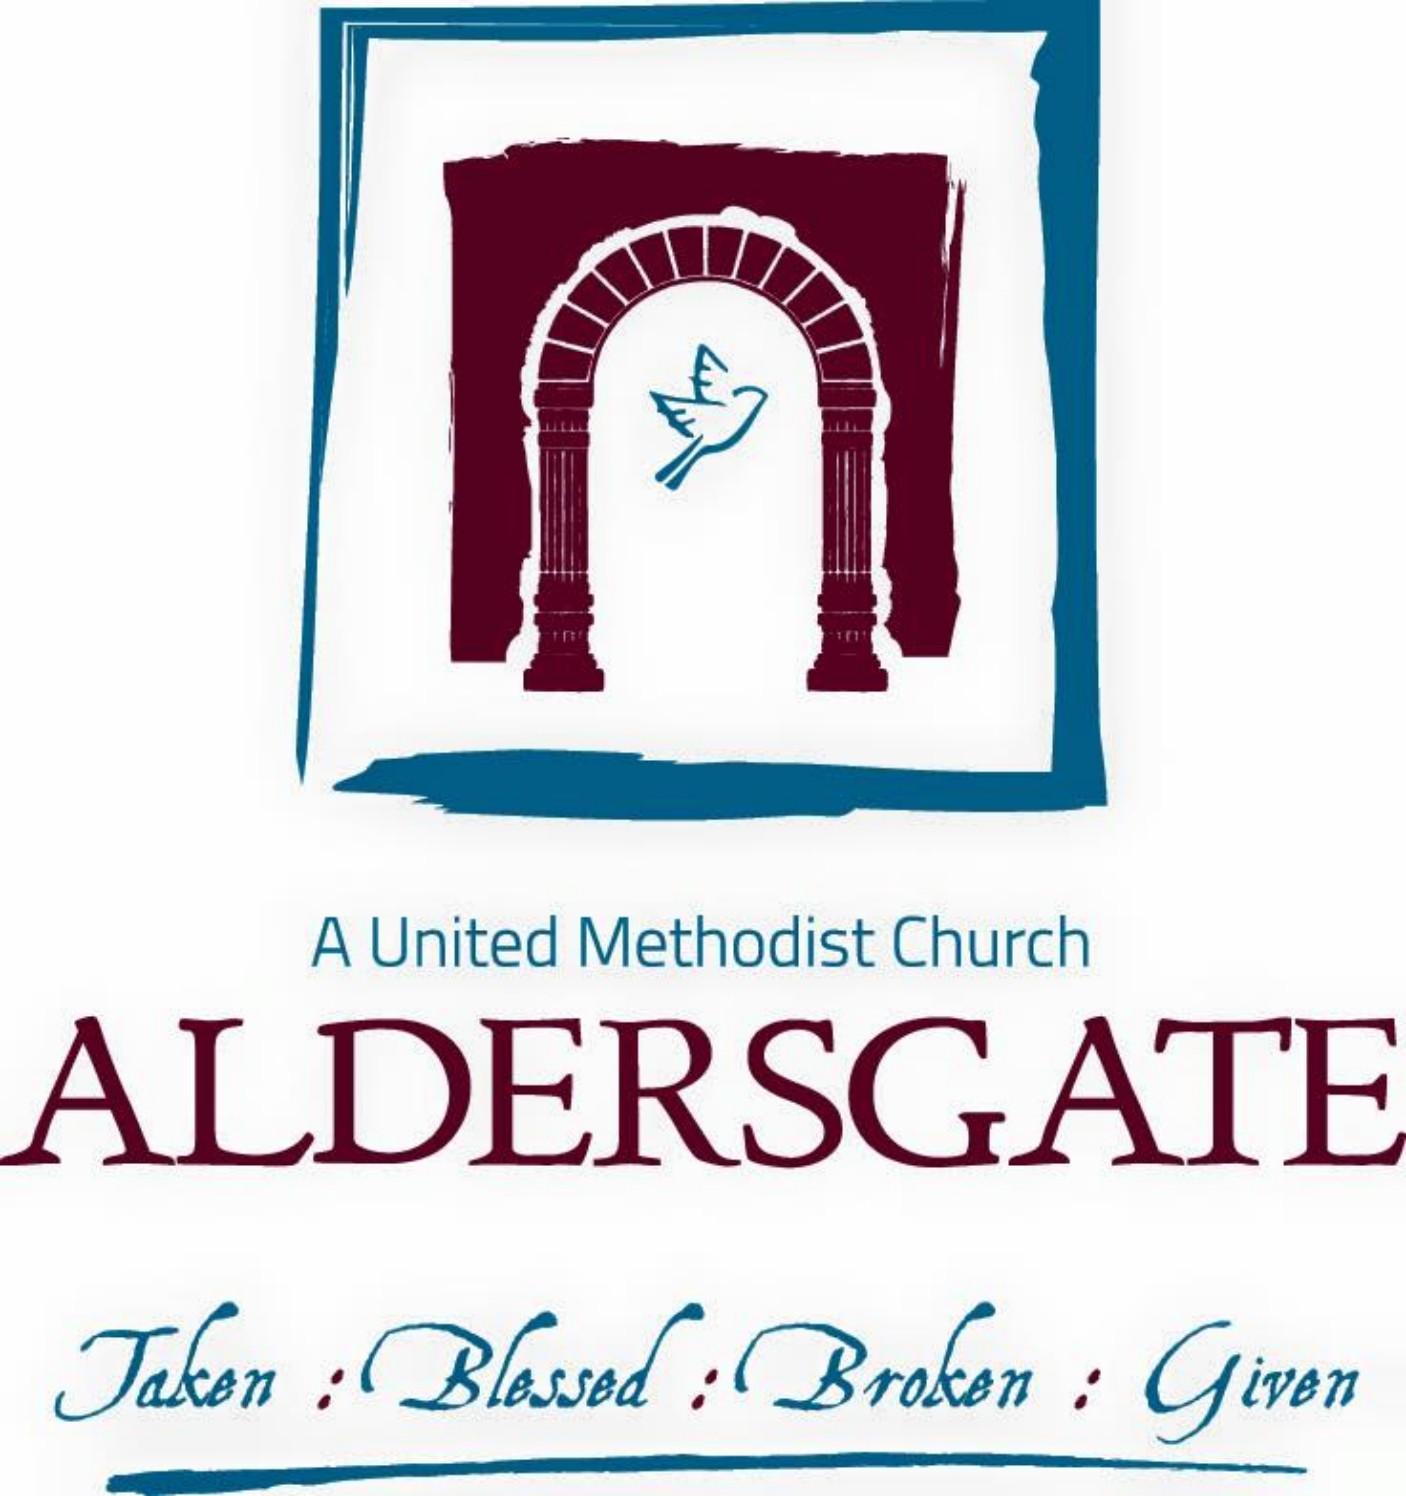 The Aldersgate Kingdom Community